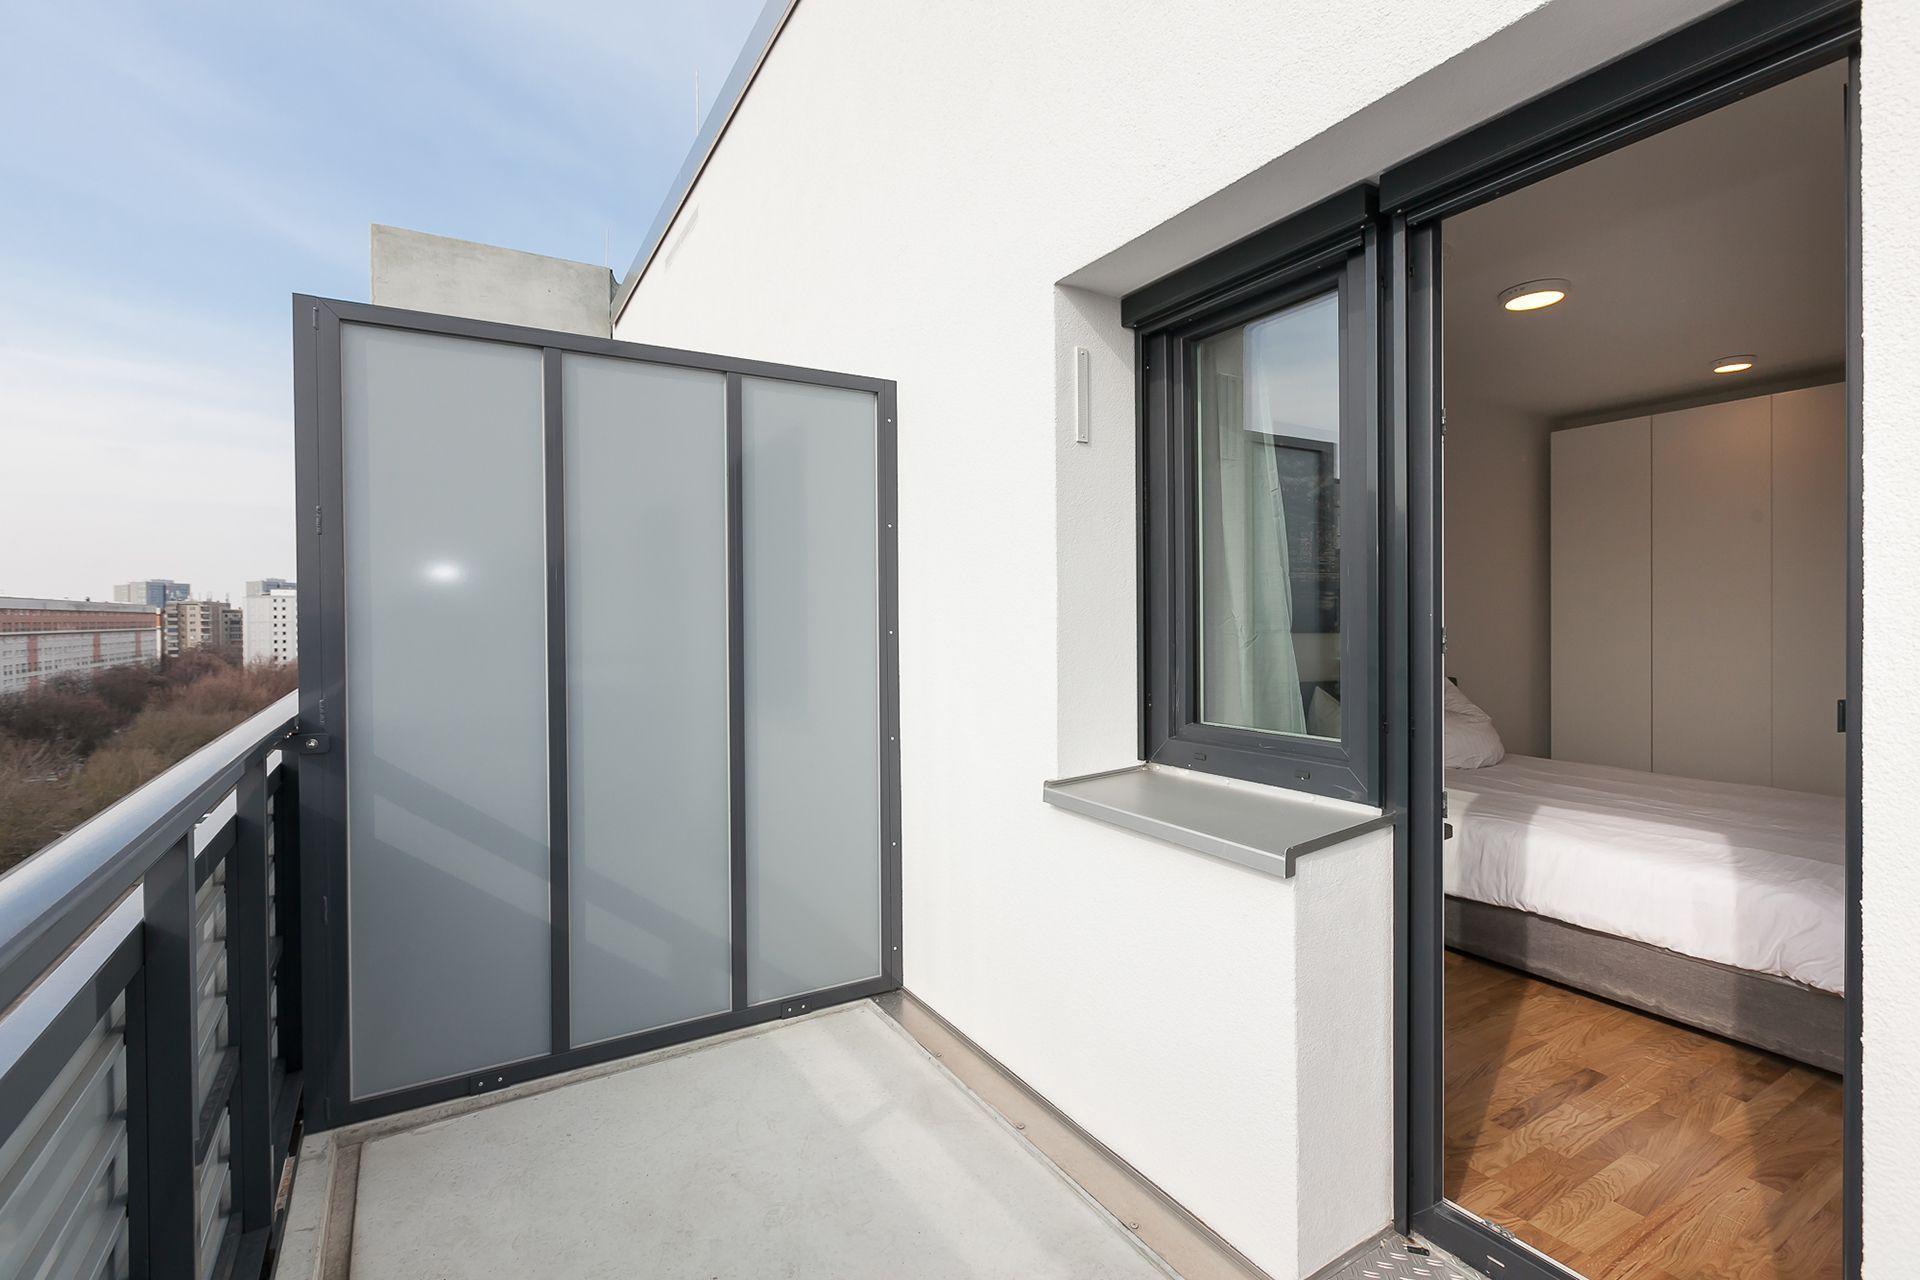 1 Bedroom - Small apartment to rent in Berlin KOEP-KOEP-0812-0